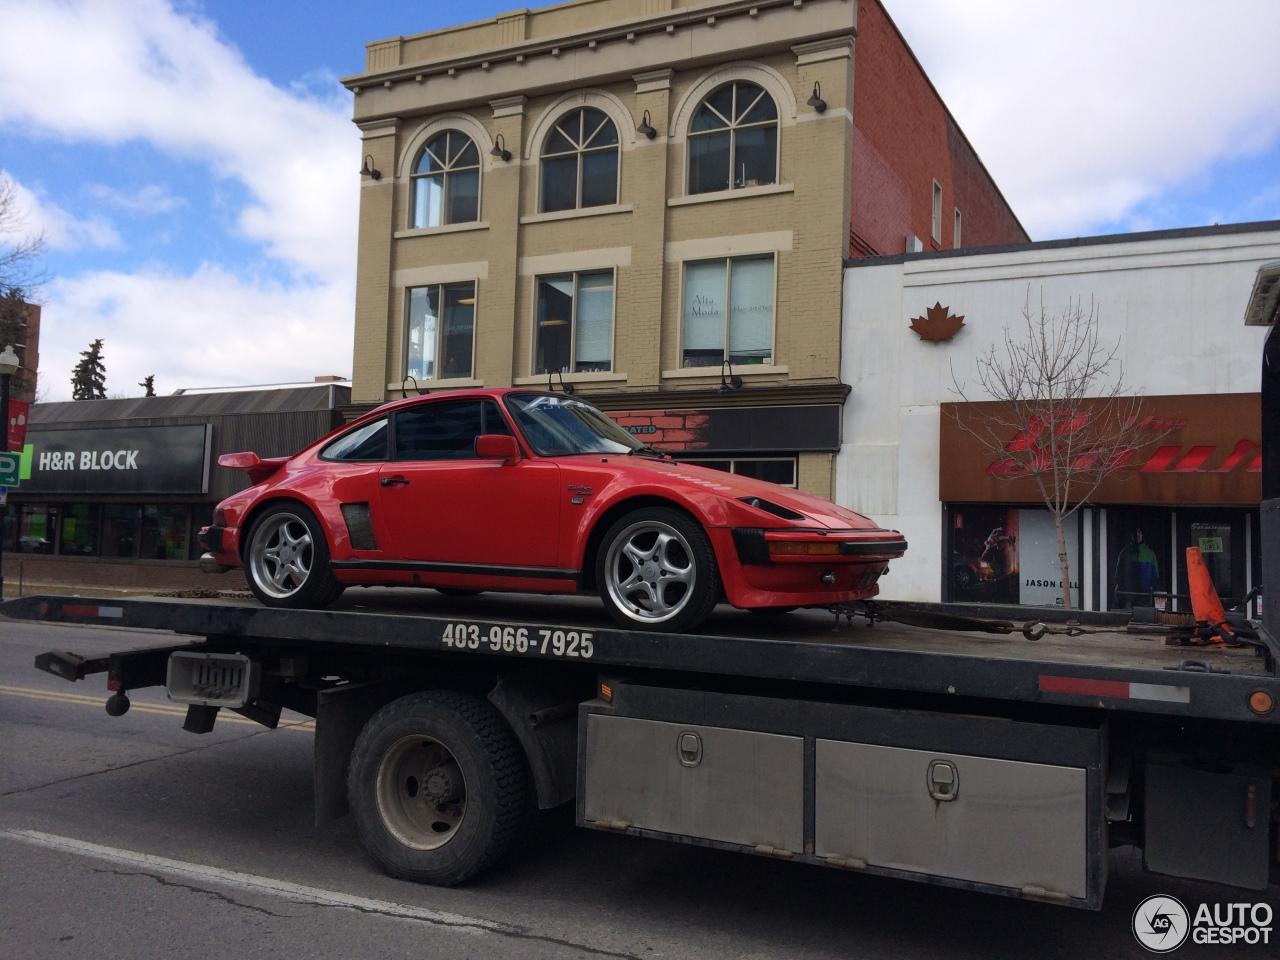 Porsche 930 Turbo Flatnose 13 April 2014 Autogespot